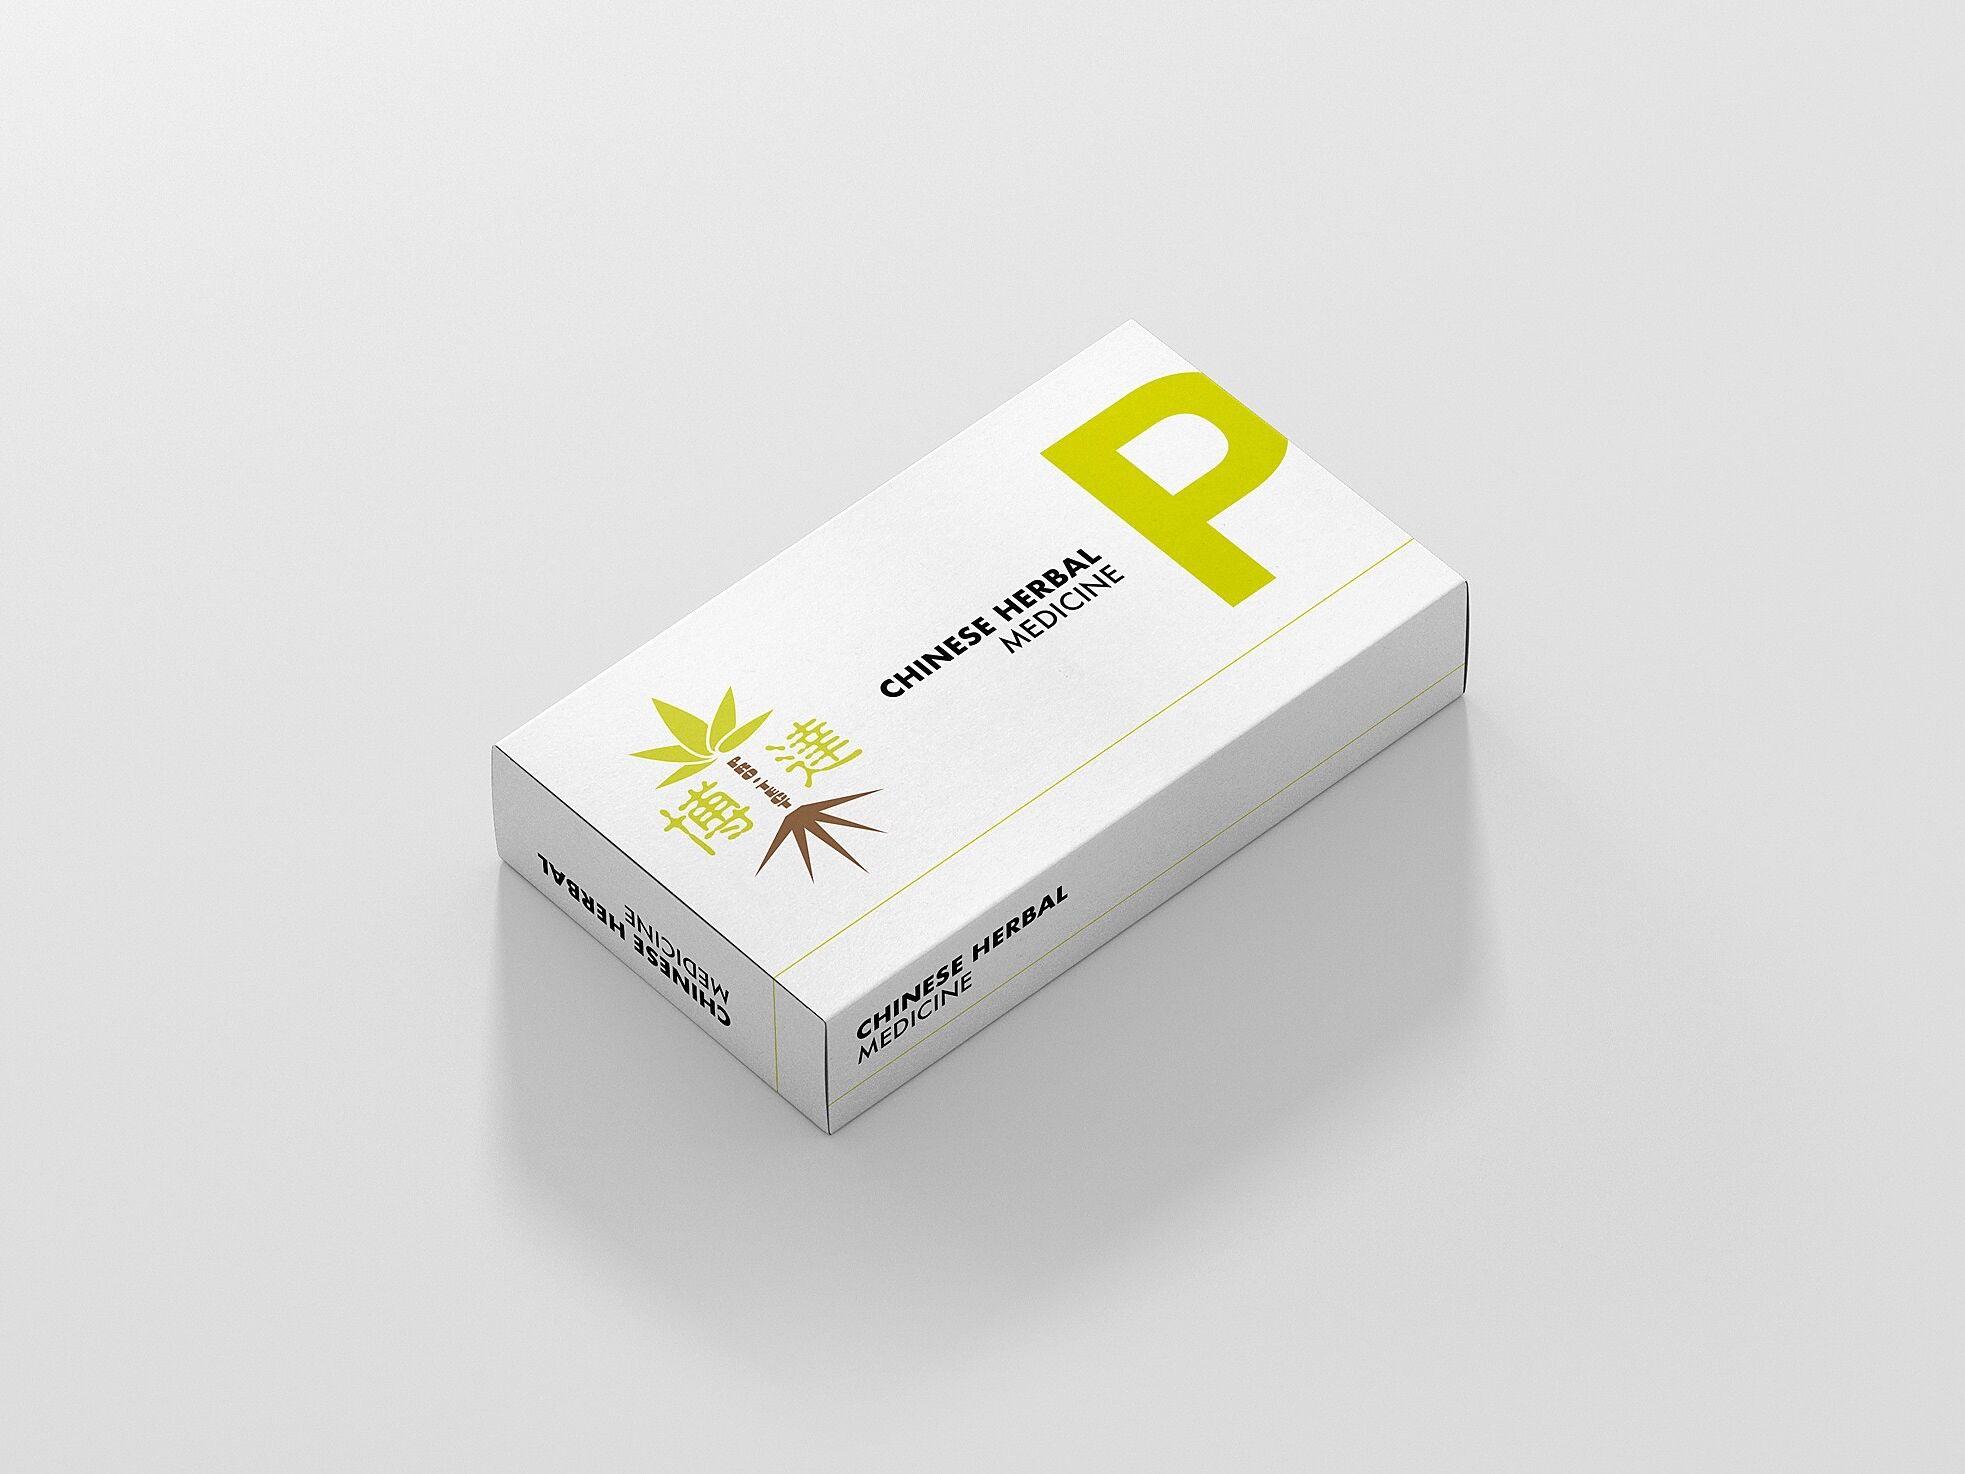 Pro Tect Medicine Box Perfectlyclear